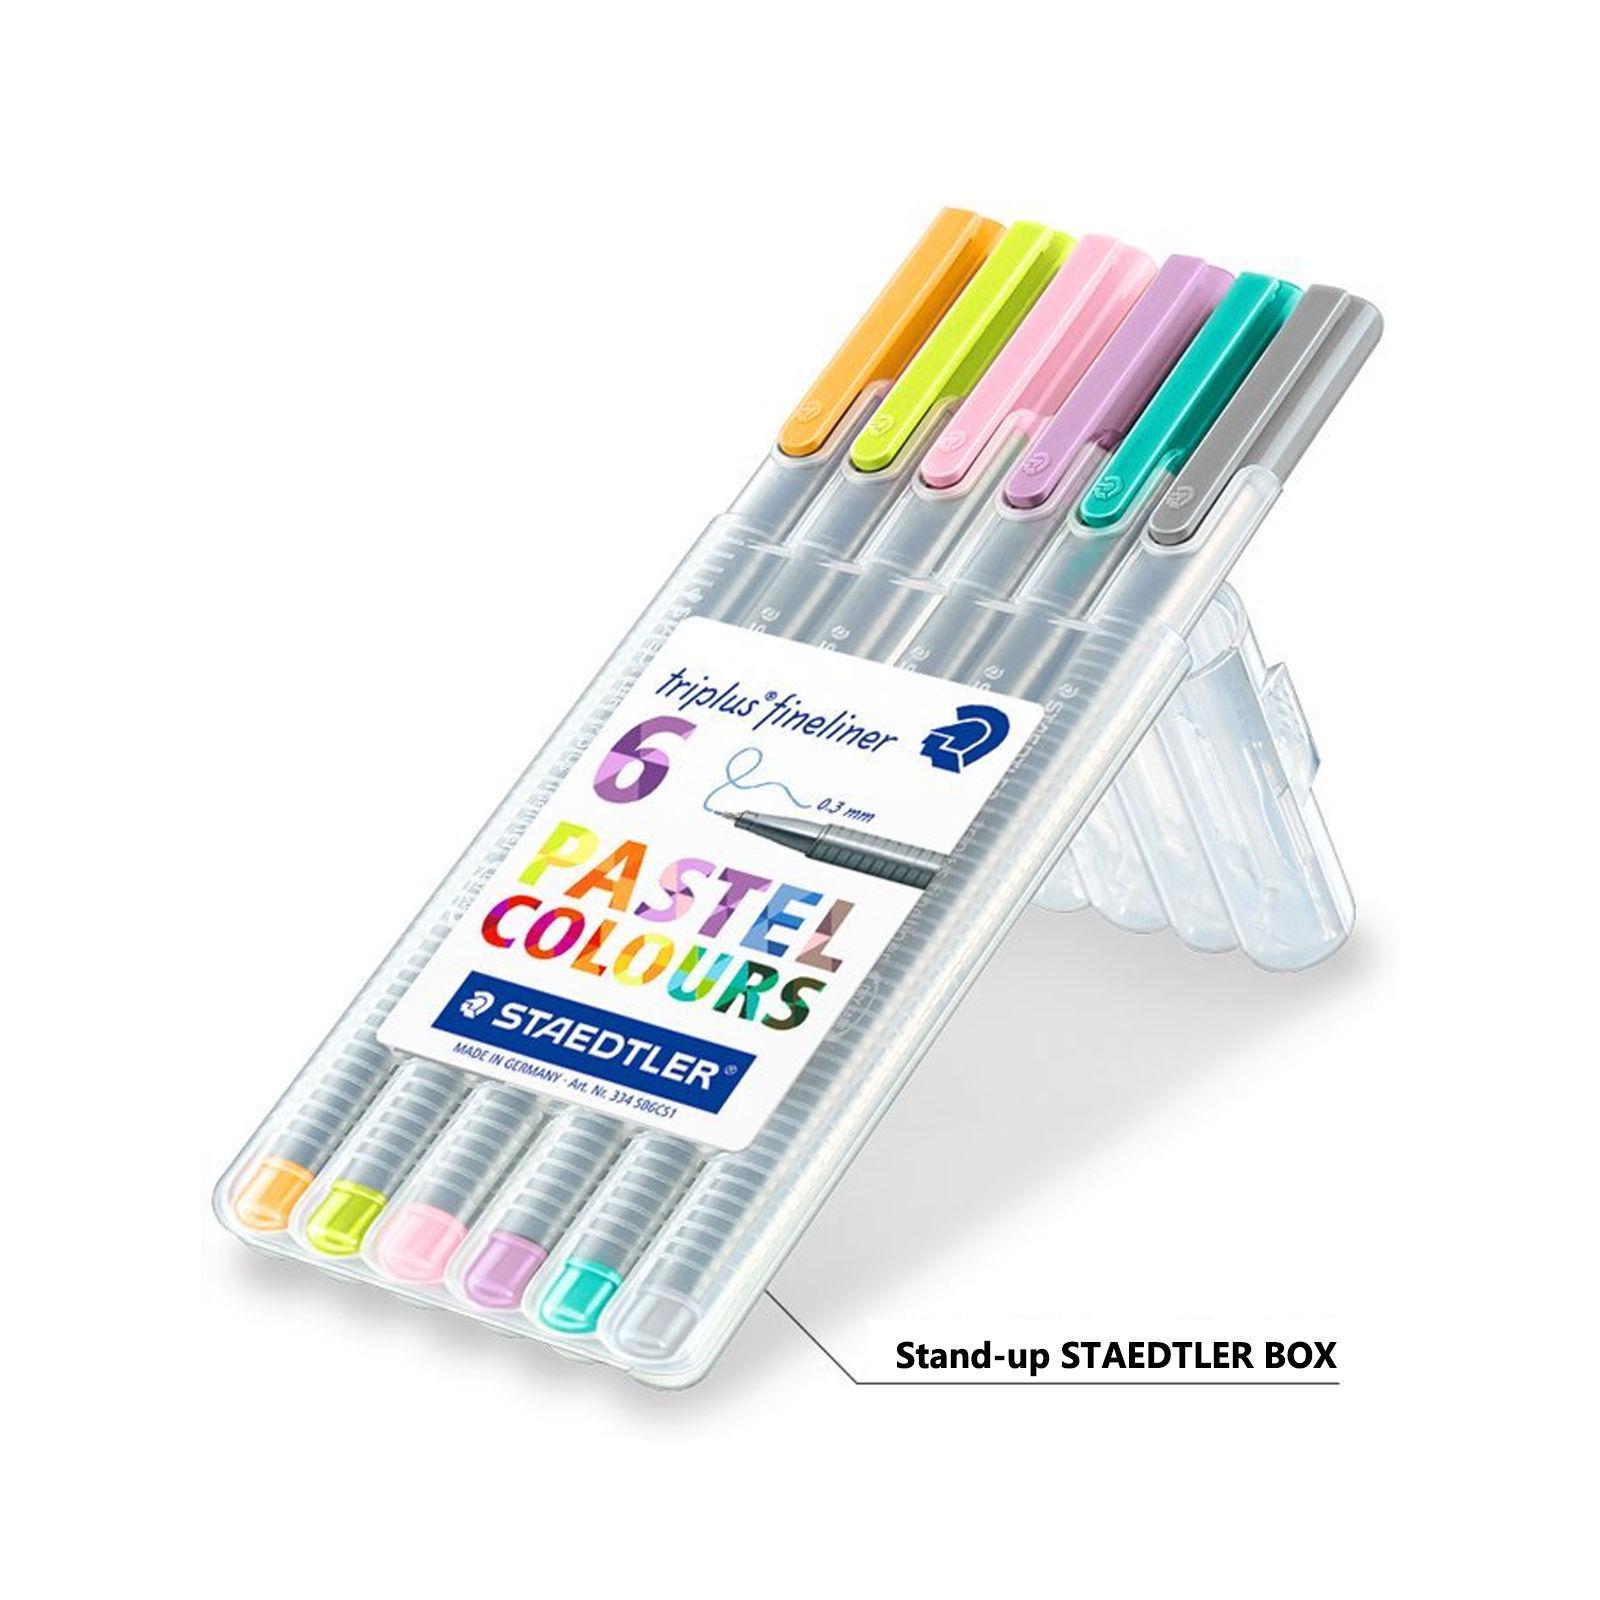 Staedtler-Triplus-Fineline-Pens-03mm-PASTEL-COLOURS-6-Pack-Desktop-Box-NEW-152272651109-3